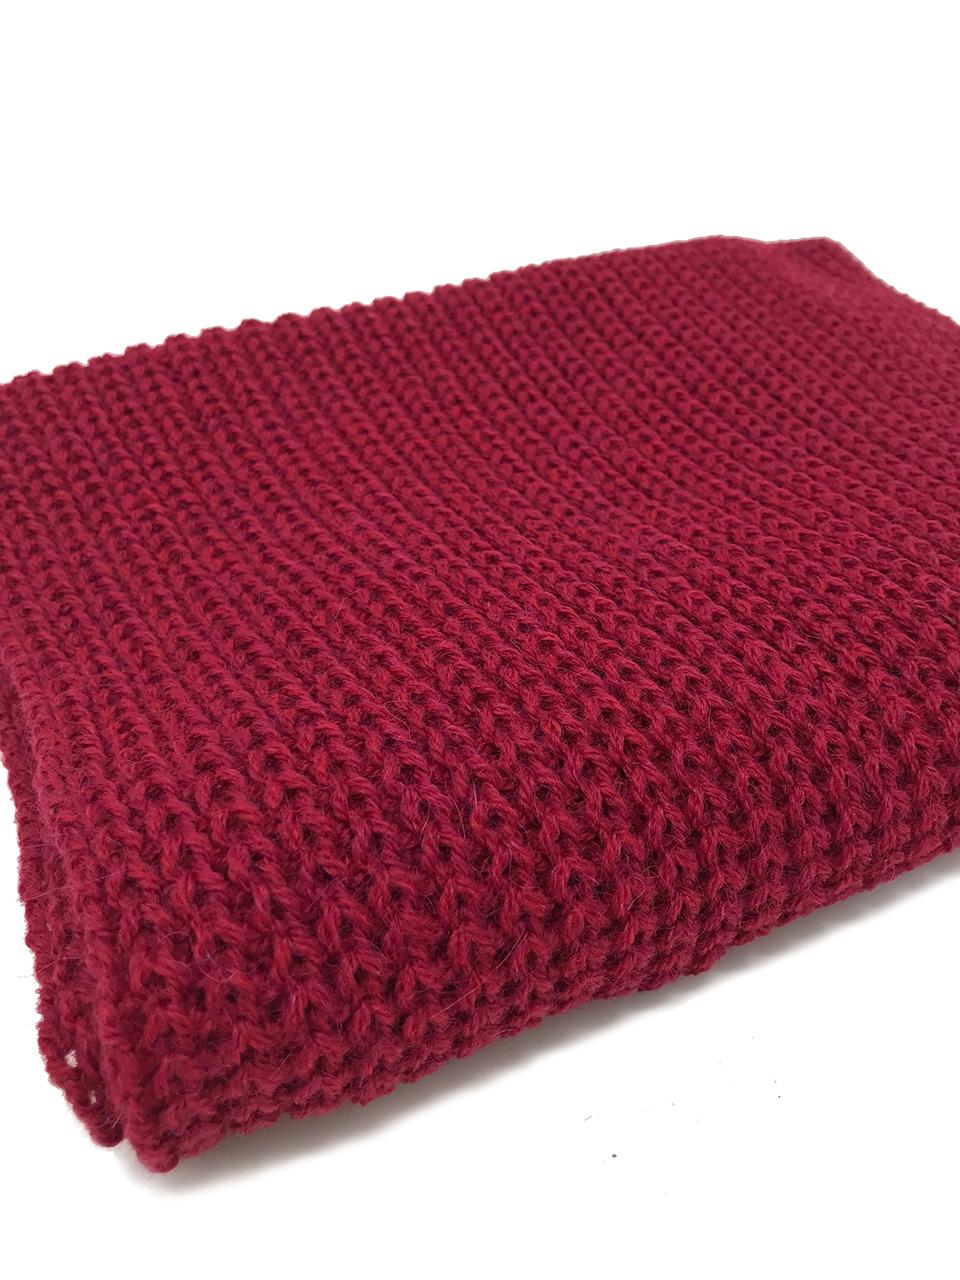 Hand Knit Infinity Circular Scarf / Snood - Alpaca Wool & Acrylic Folded showing detail